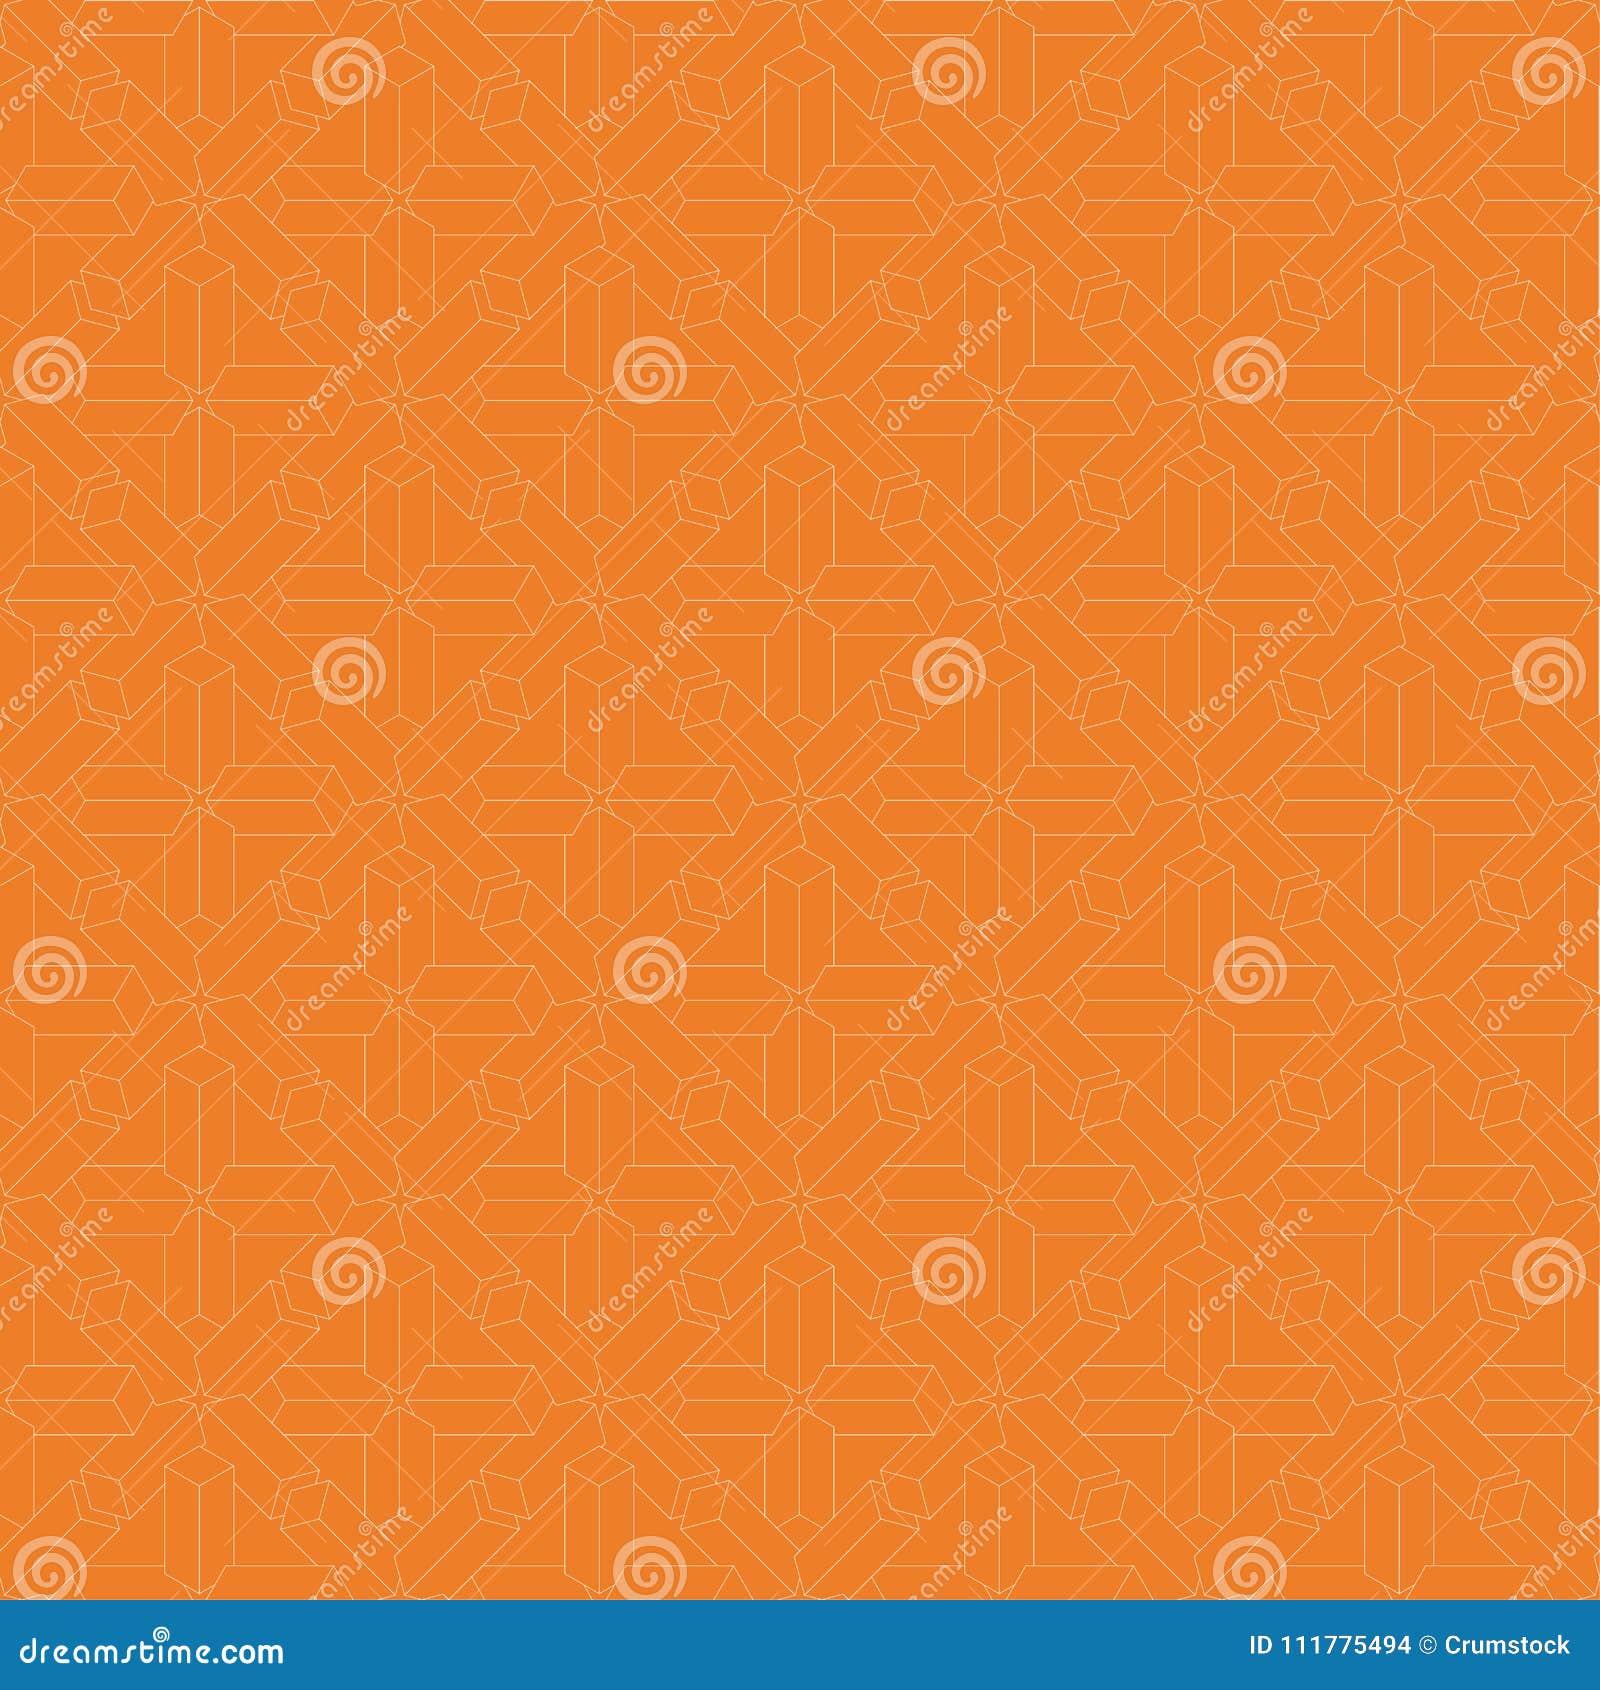 Geometric ornament. Orange and white seamless pattern